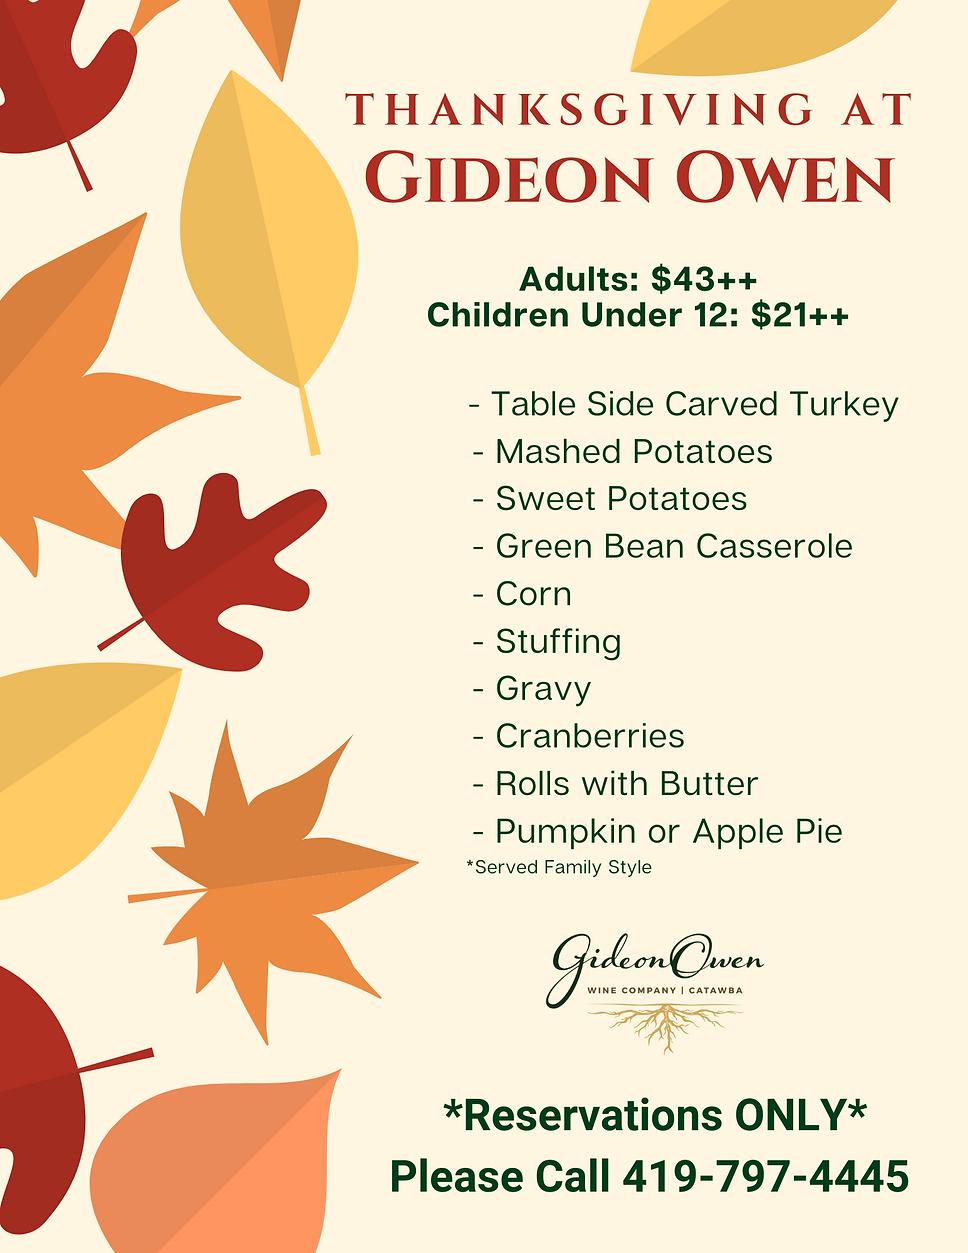 G.O. Thanksgiving (2).png